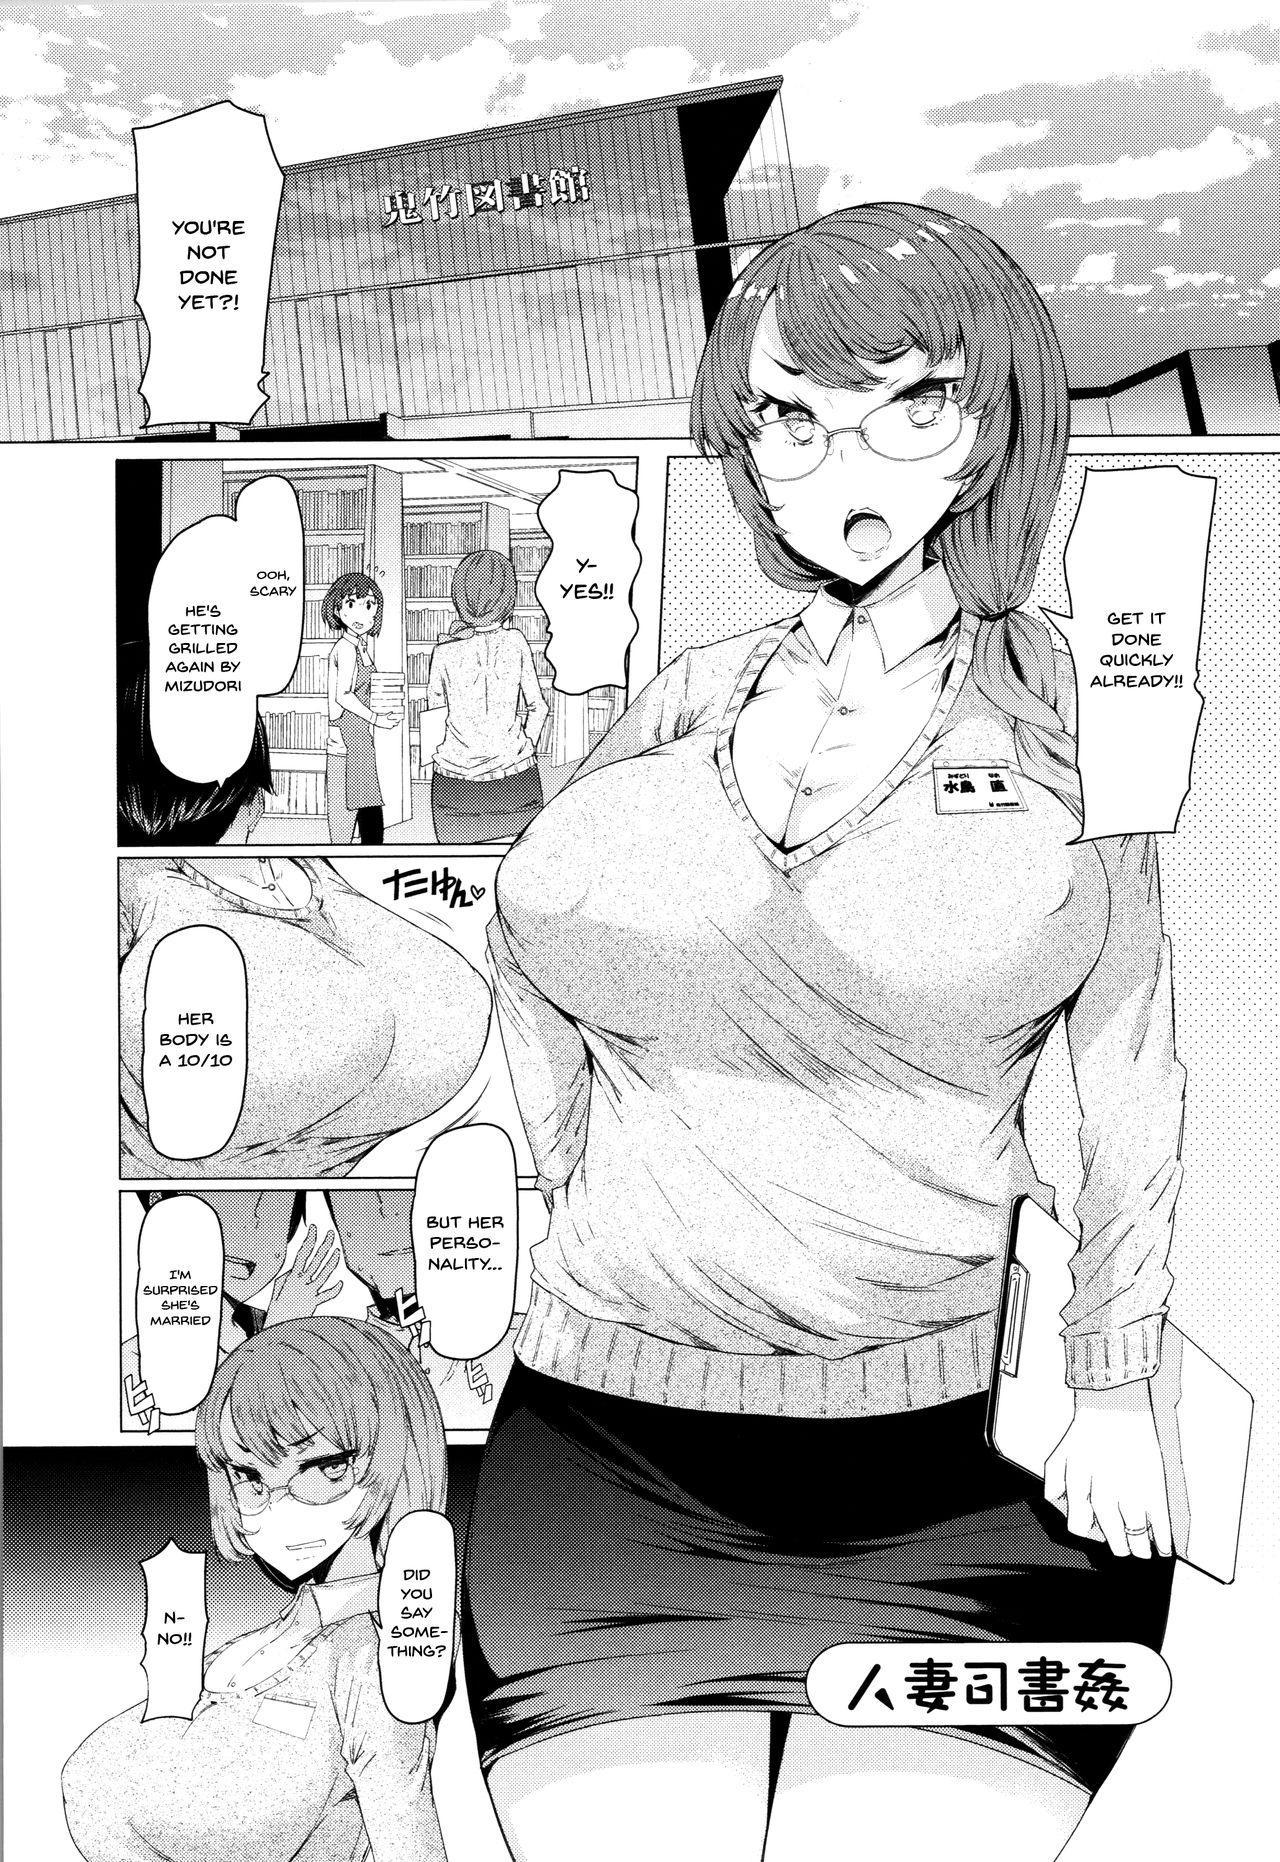 Hitozuma ga Ero Sugite Shigoto ni Naranai! | These Housewives Are Too Lewd I Can't Help It! Ch.1-7 94